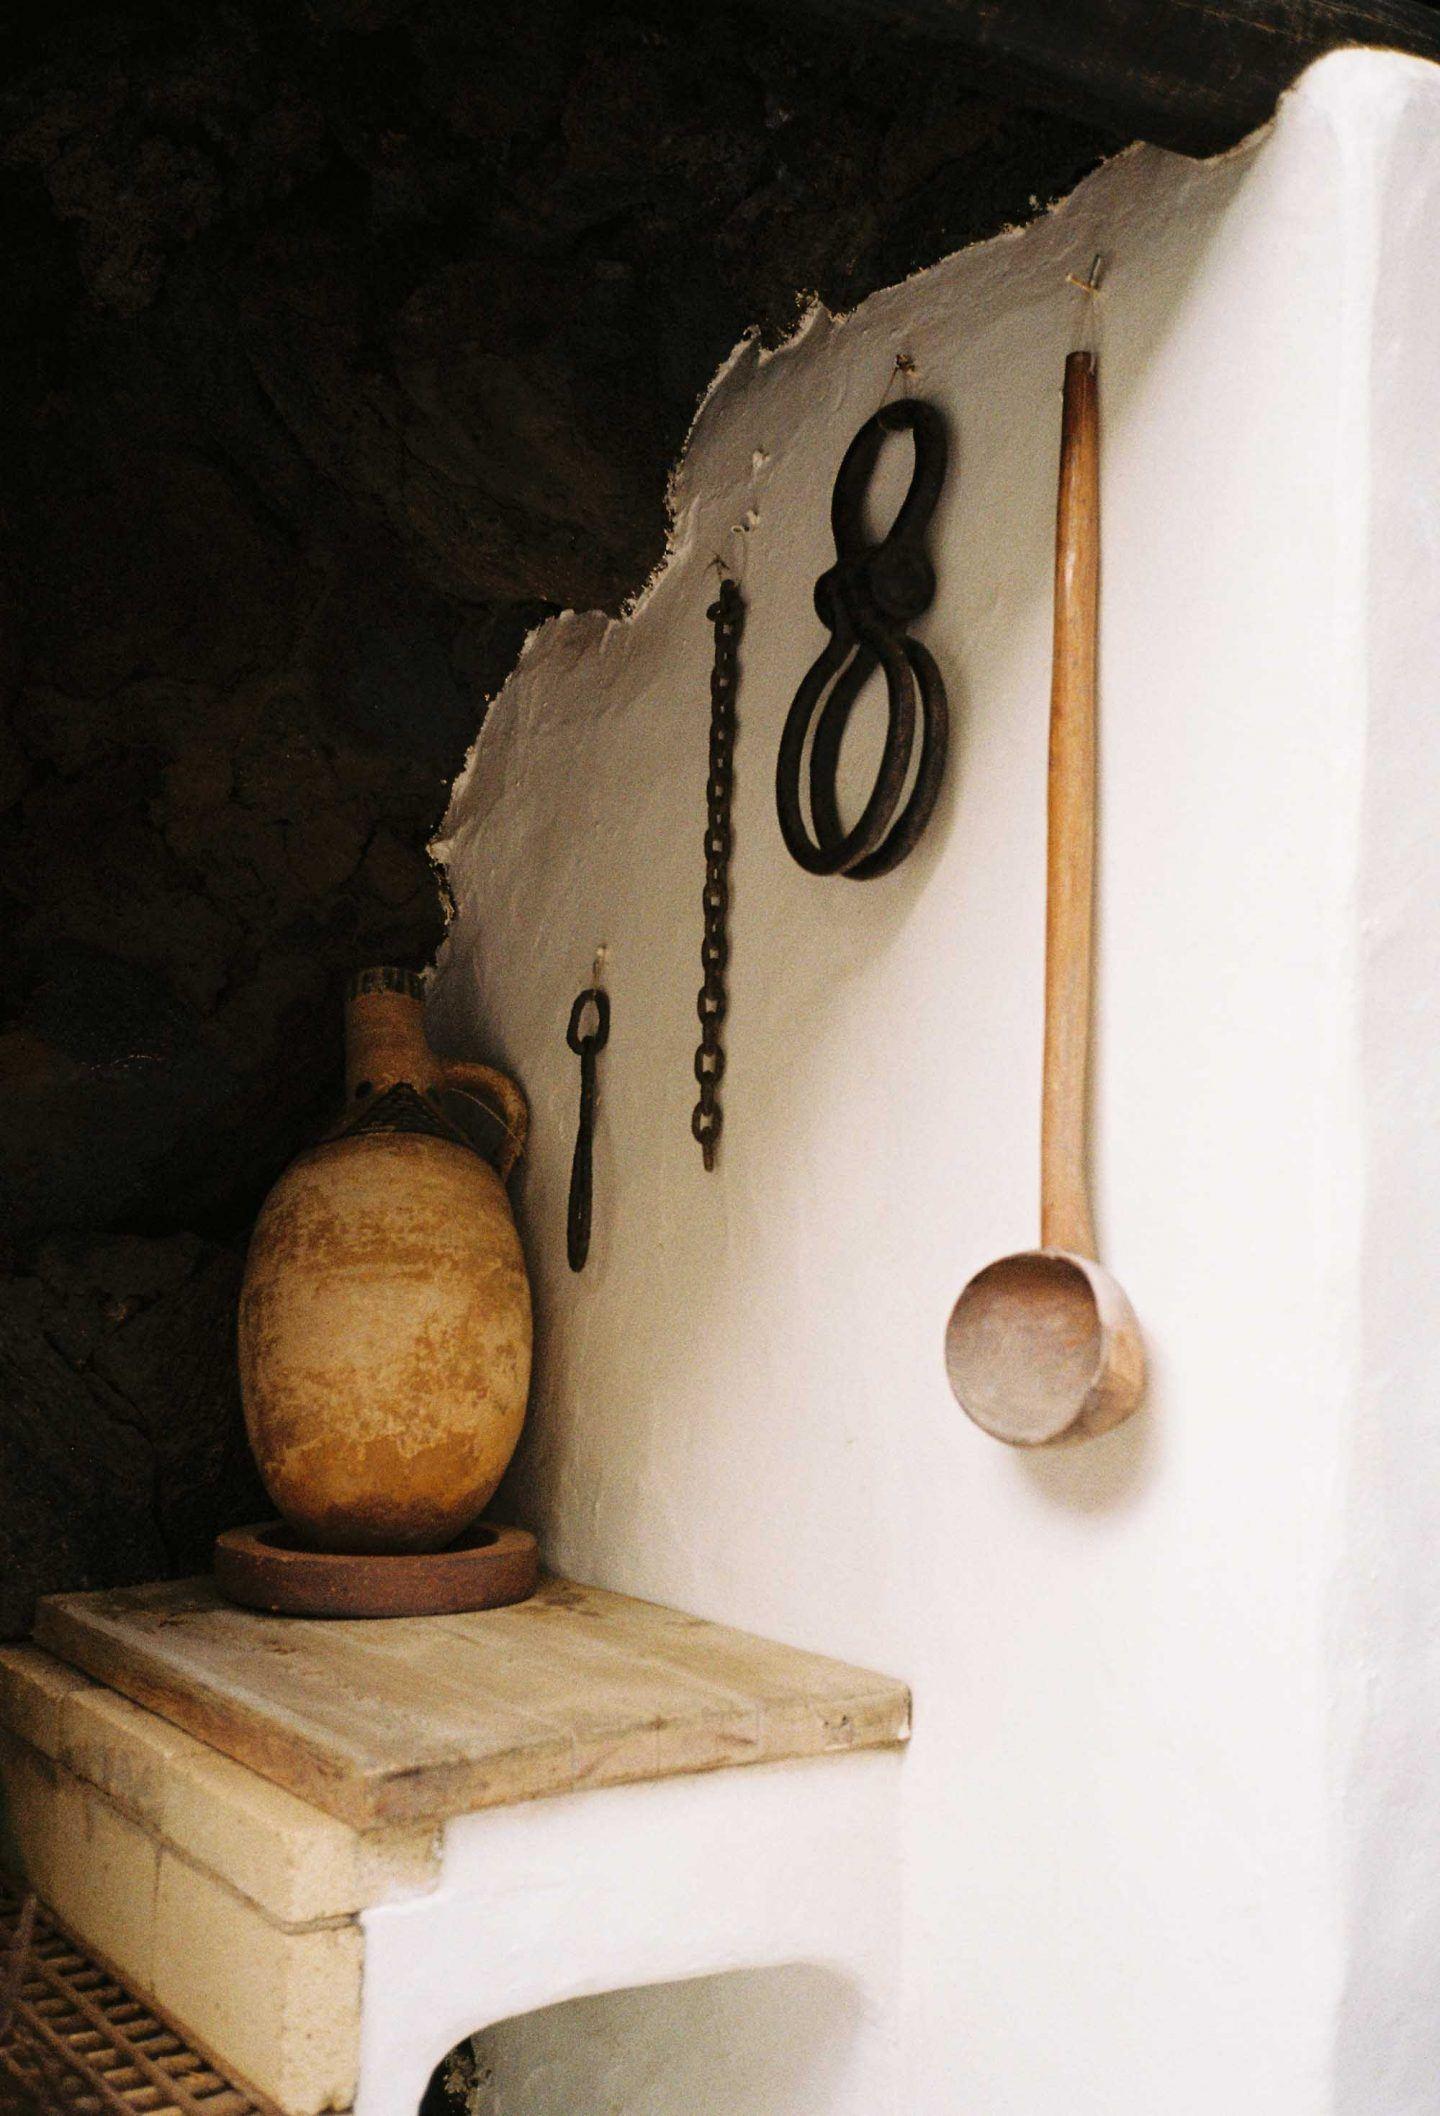 IGNANT-Photography-Arturo-Bamboo-Lanzarote-9